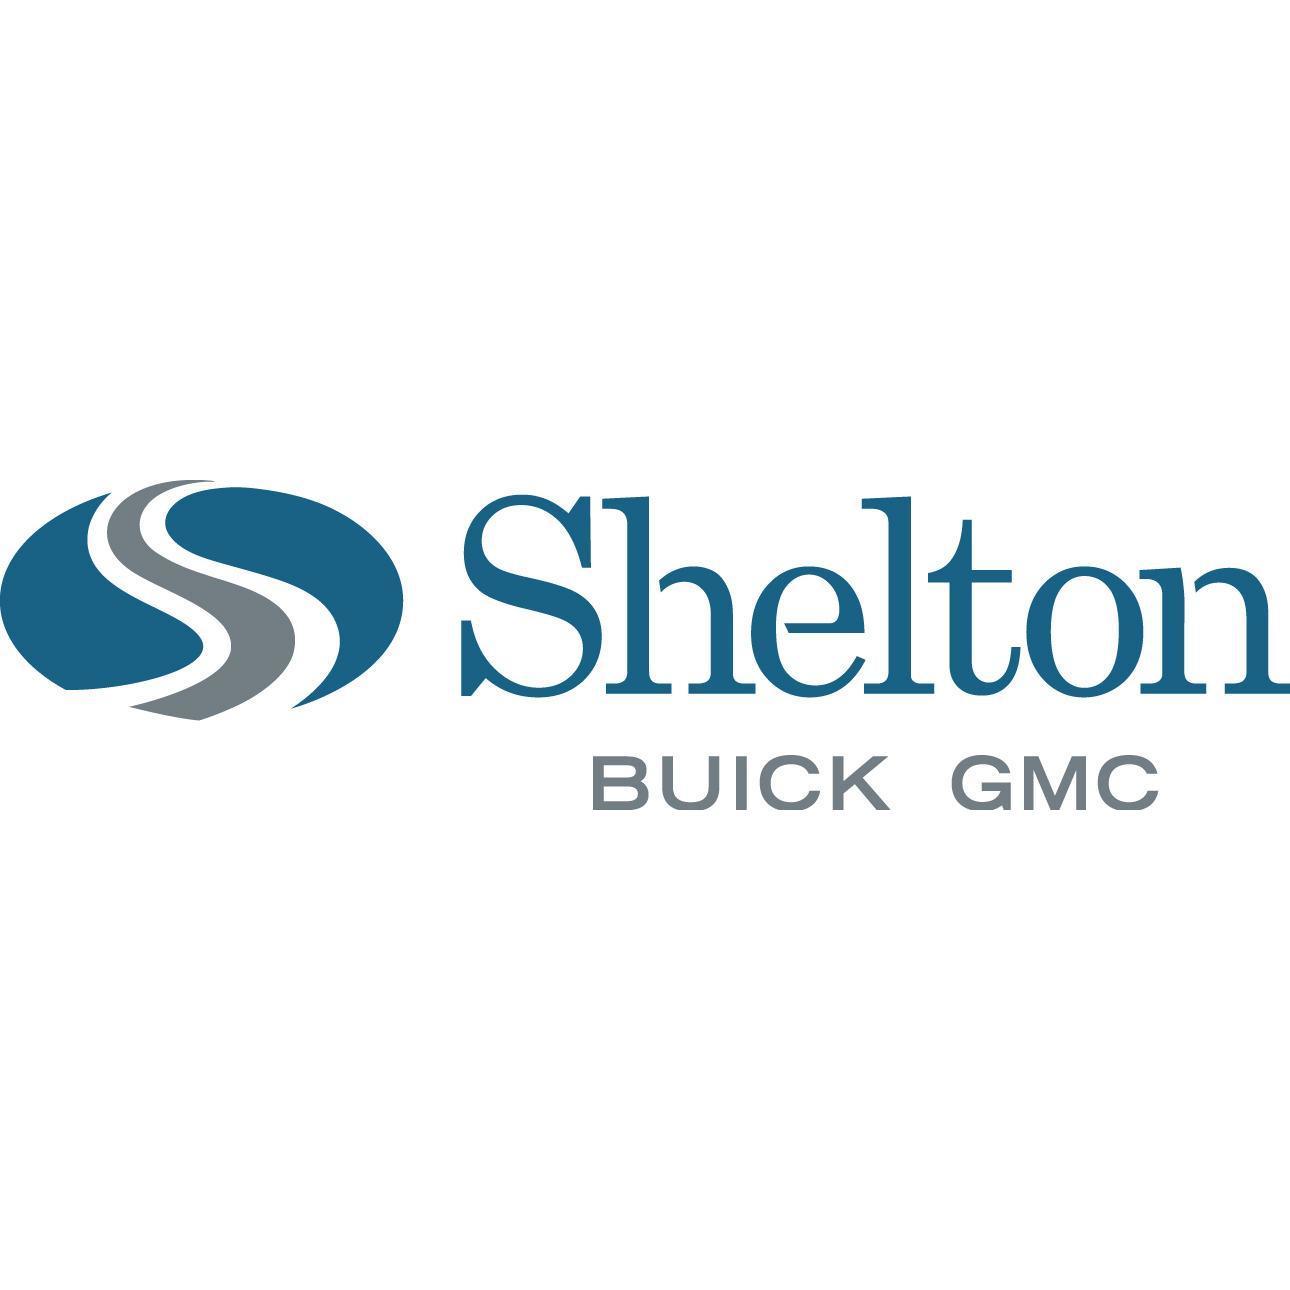 Shelton Buick Gmc In Rochester Hills Mi 48307